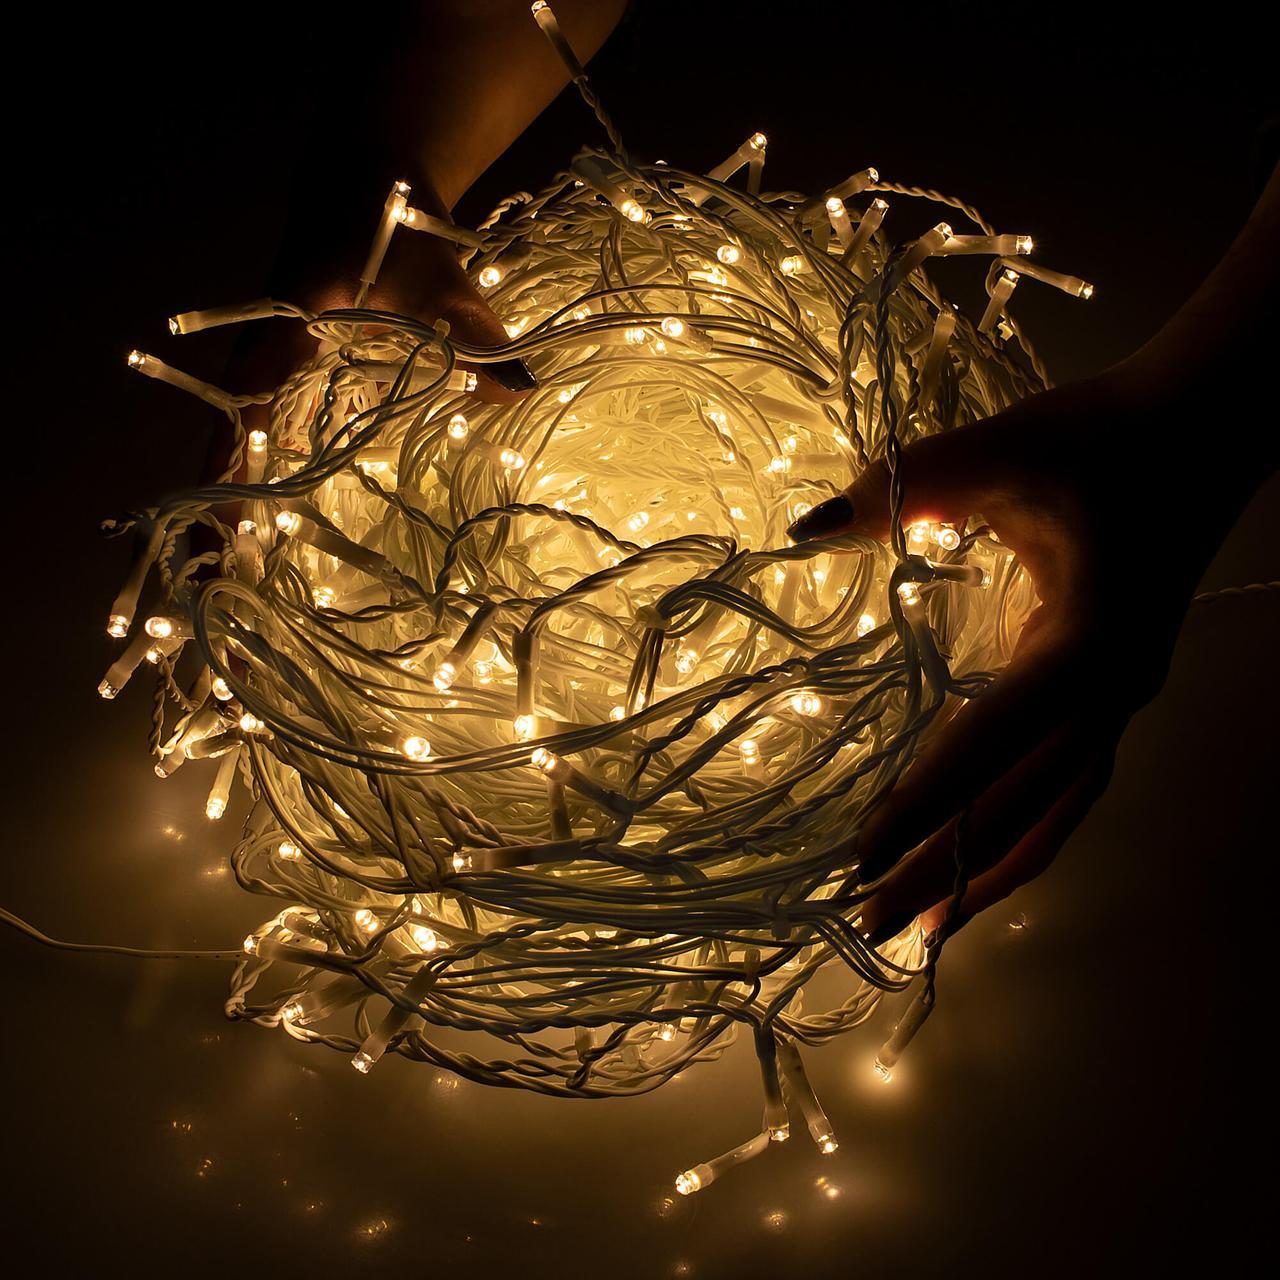 Новогодняя гирлянда Бахрома 500 LED, Белый теплый свет, 22,5 м